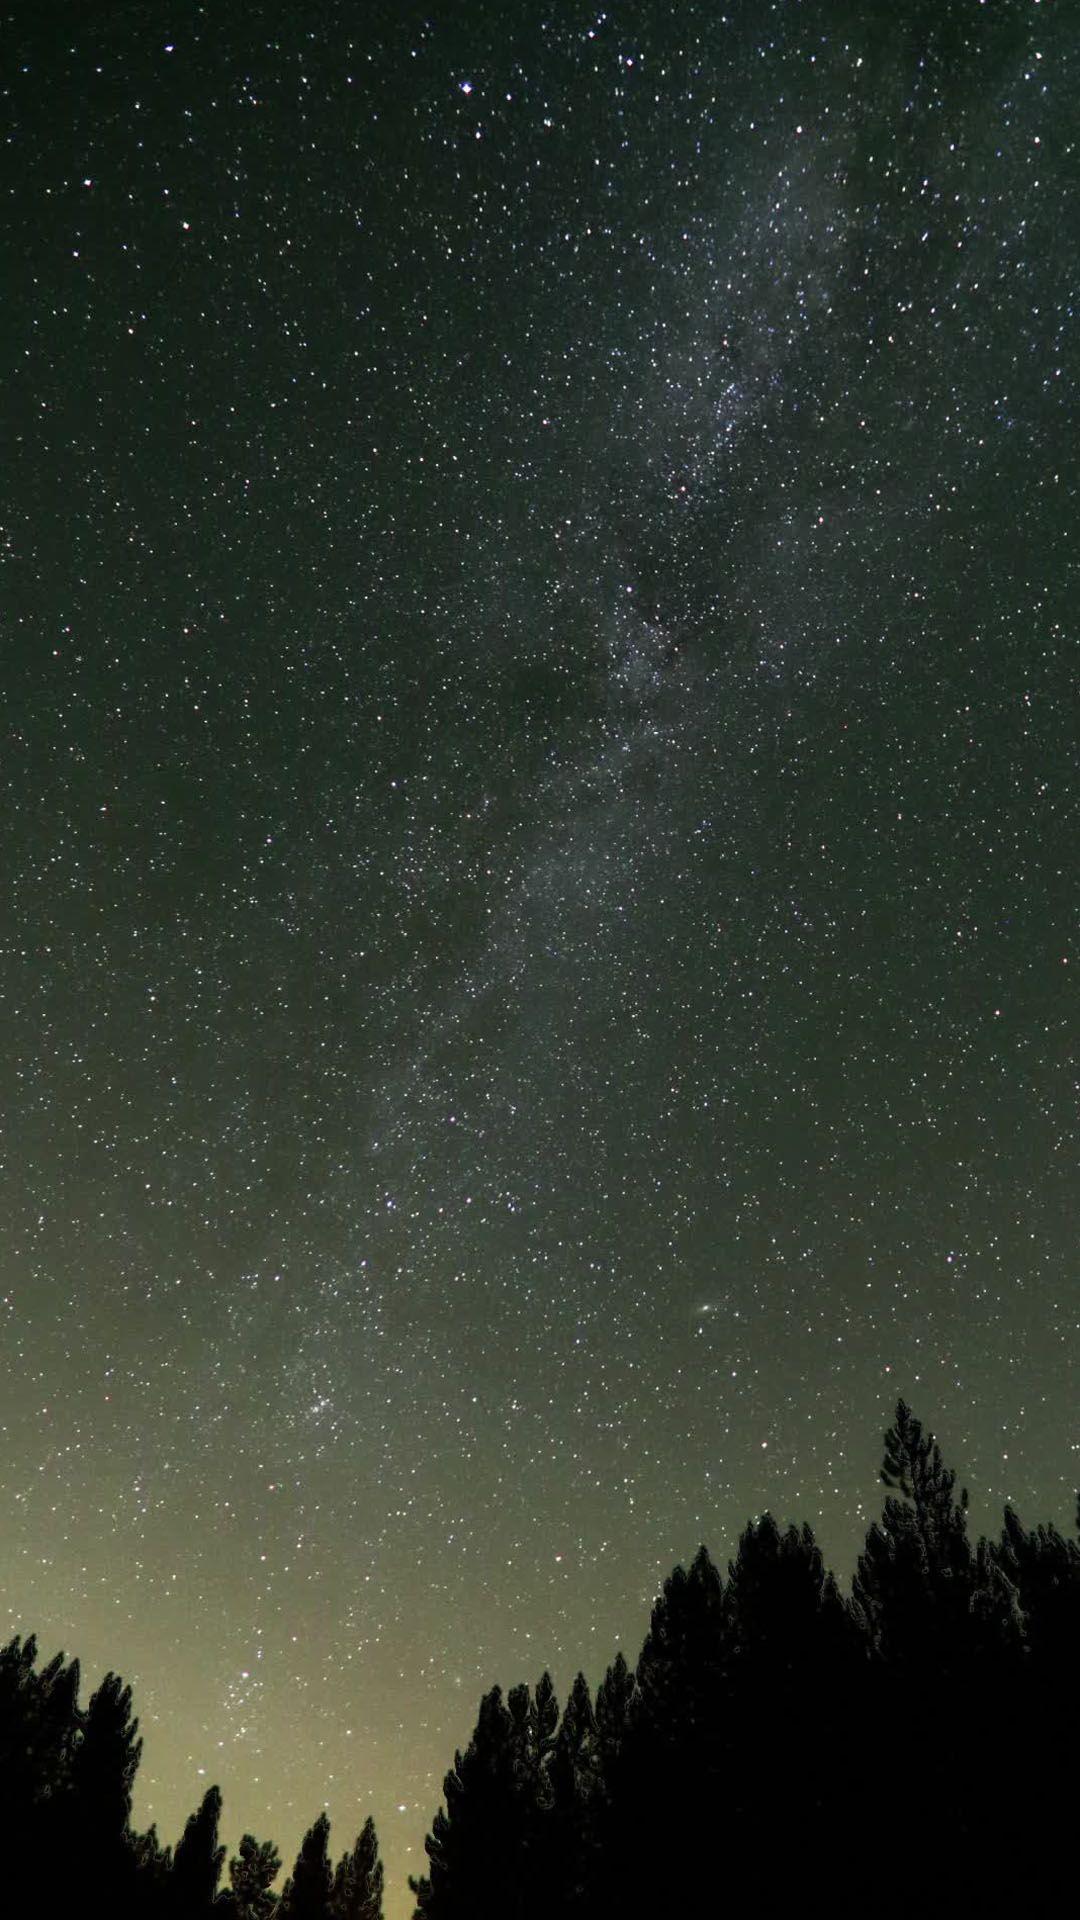 Starry Night Sky Wallpaper 1080x1920